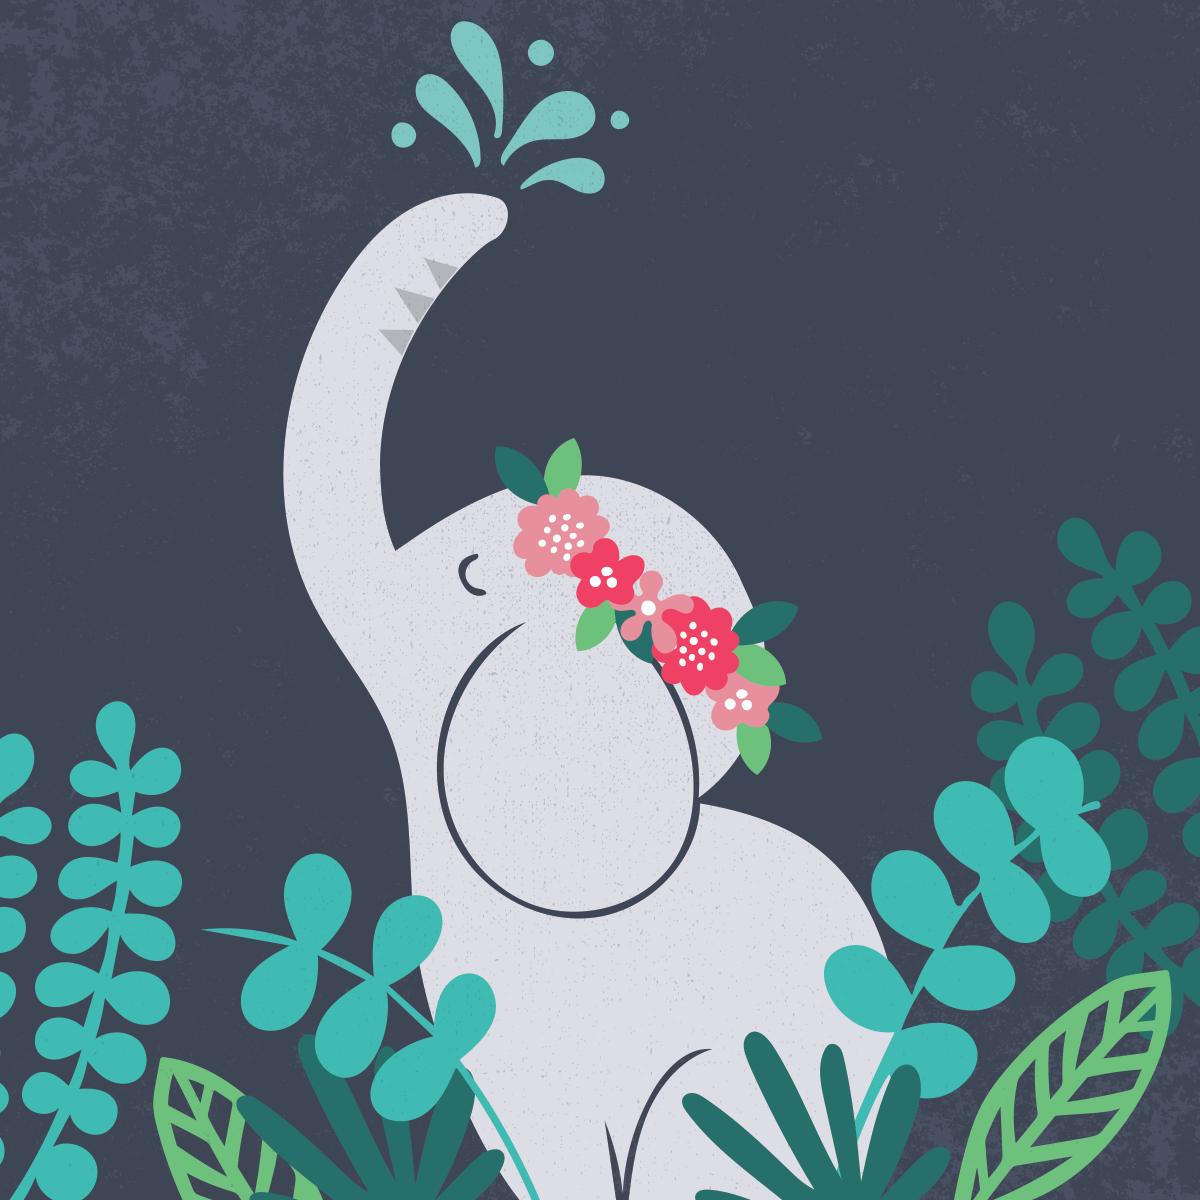 Elephant illustration by Pace Creative Design Studio